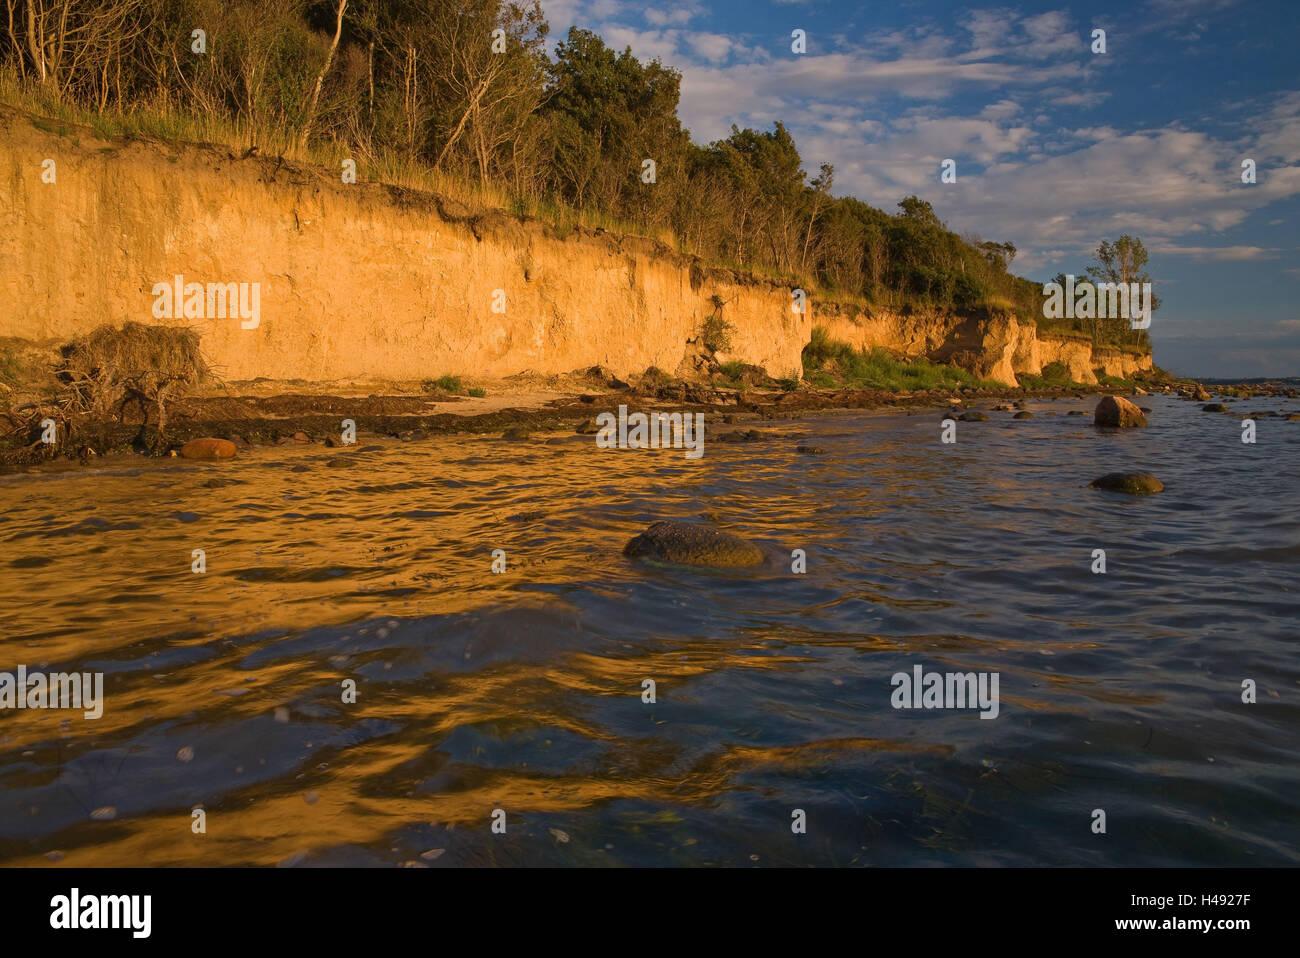 Baltic Sea, Insel Poel, coast, - Stock Image